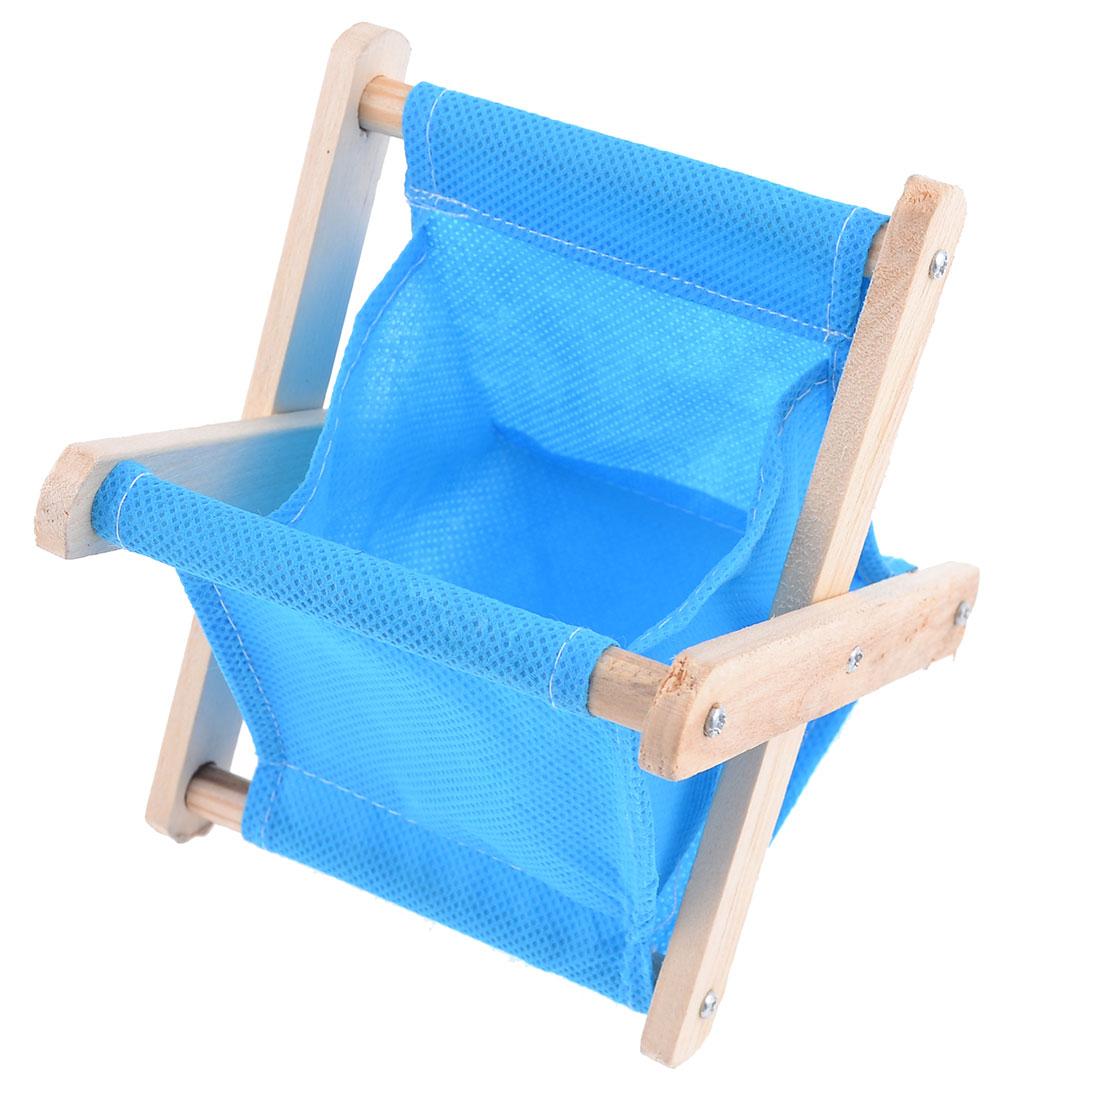 Wood Frame Foldable Tabletop Storage Box Pouch Bag Basket Blue